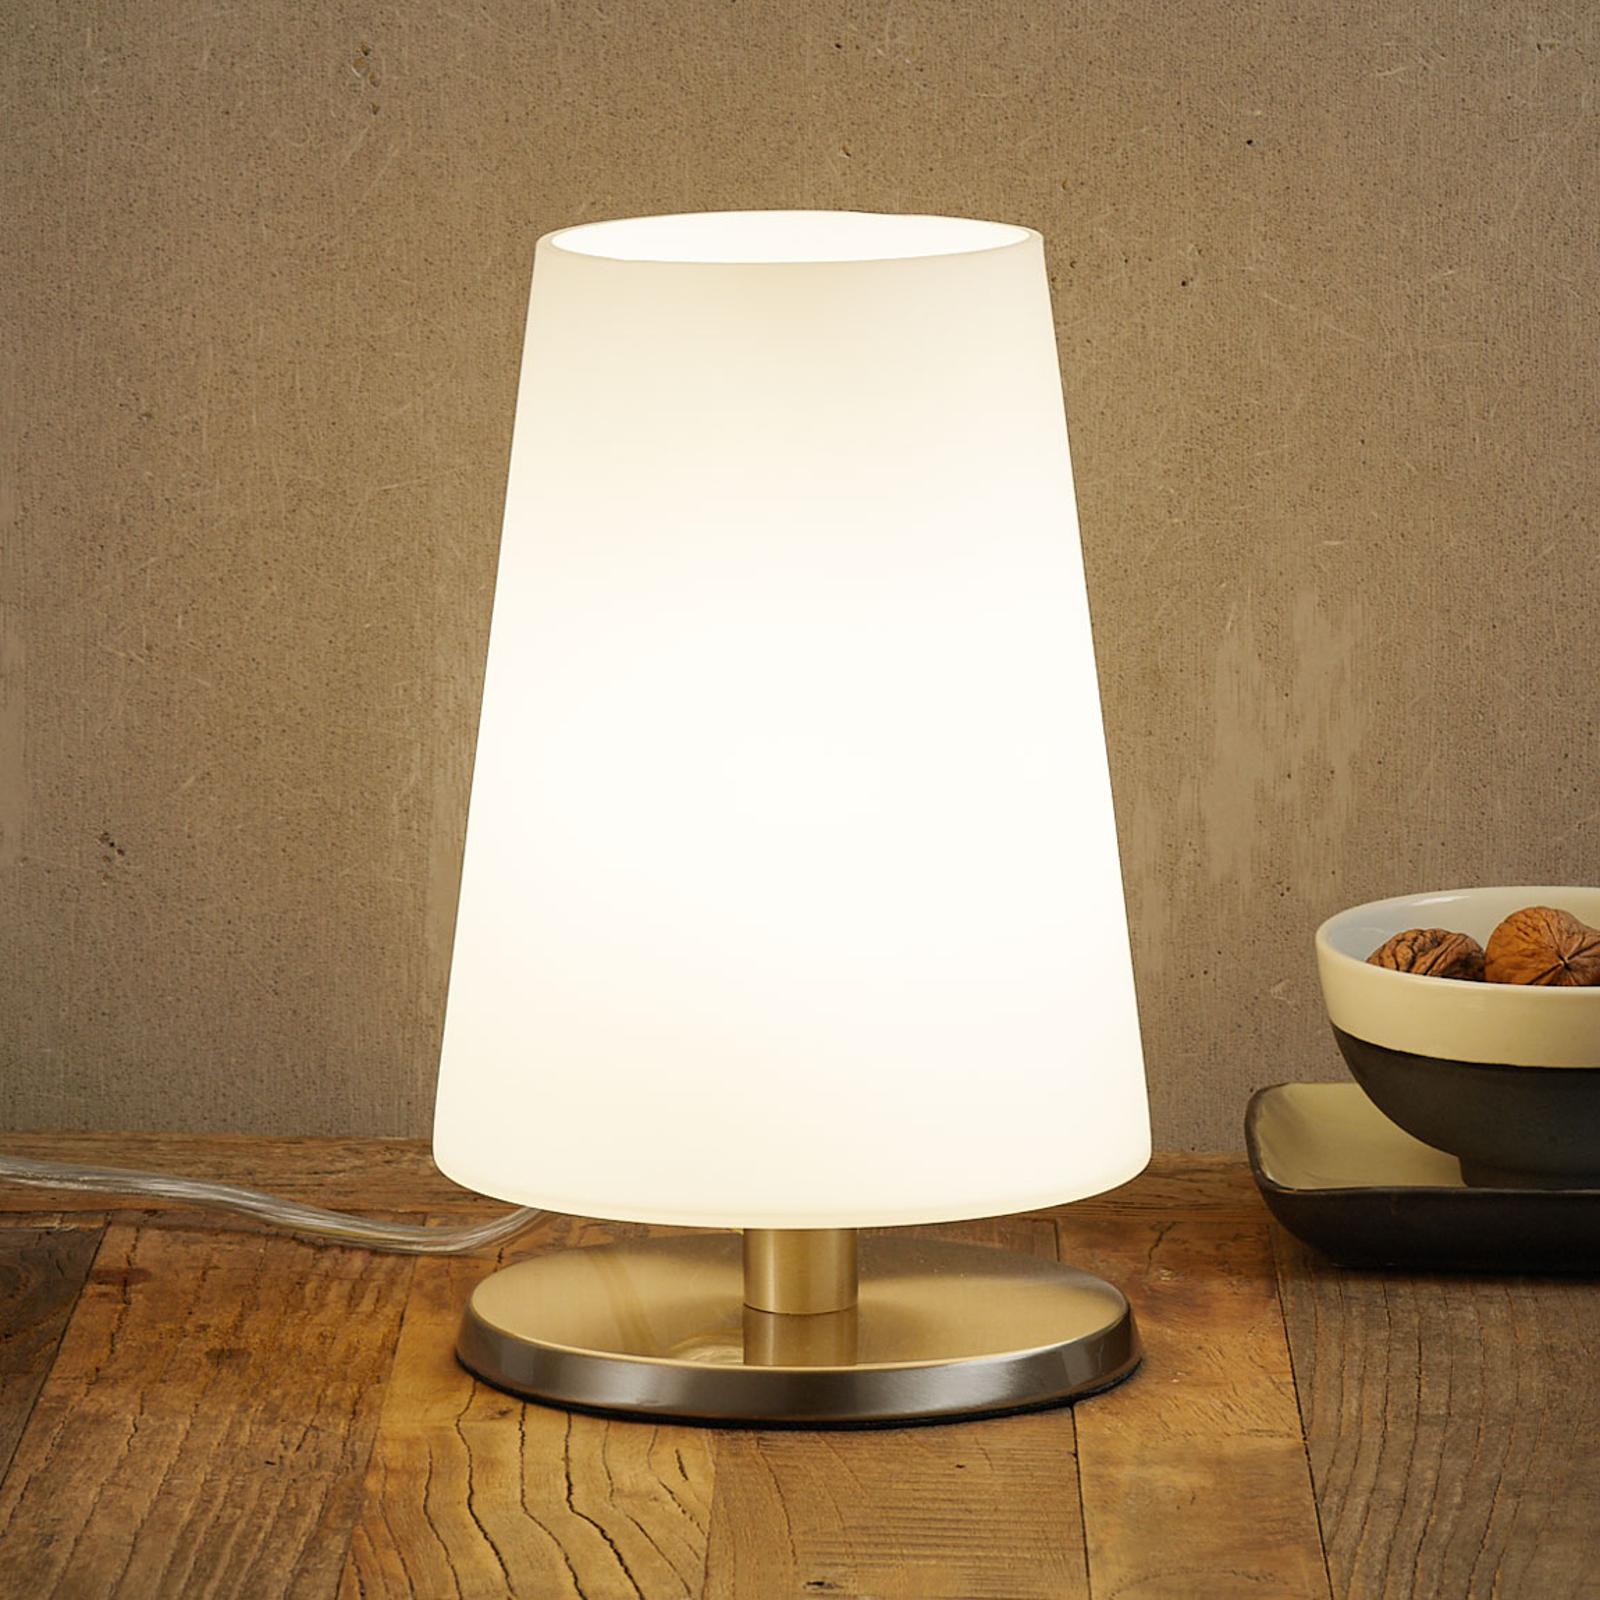 Lampe à poser Ancilla acier, variateur sensitif